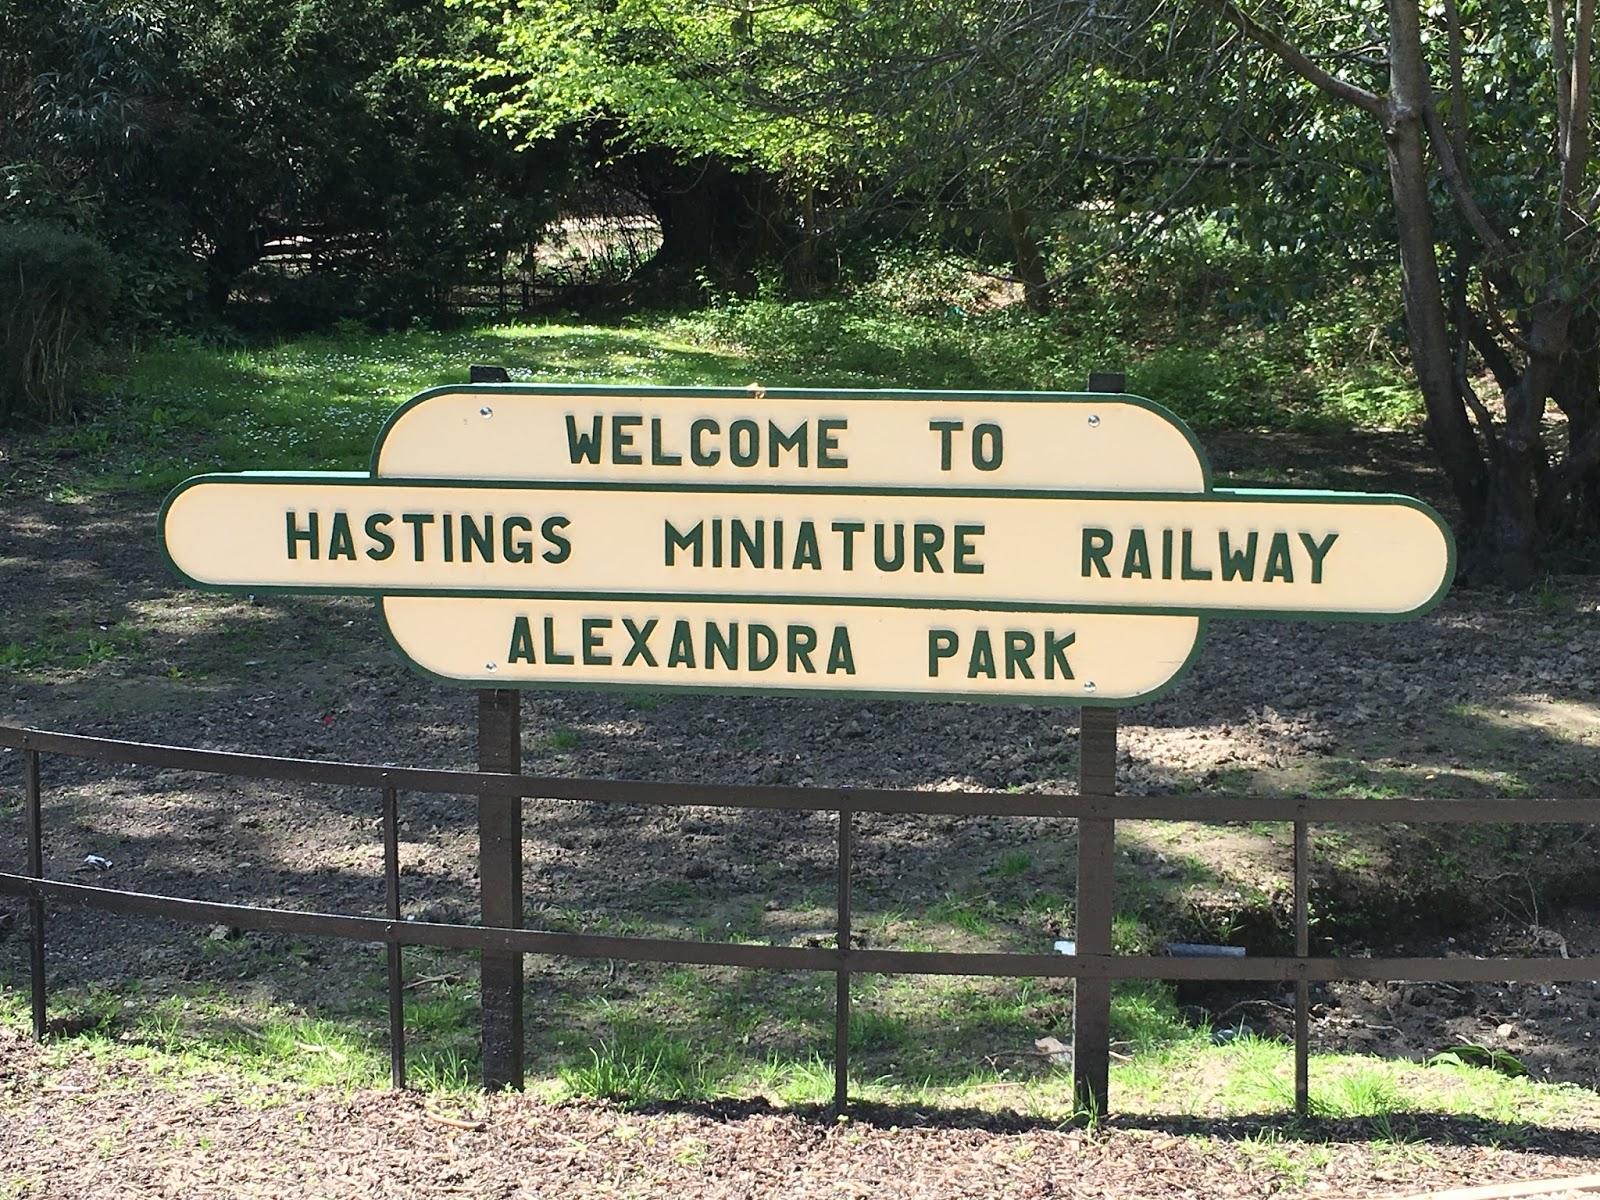 Alexandra Park – Miniature railway and wild garlic